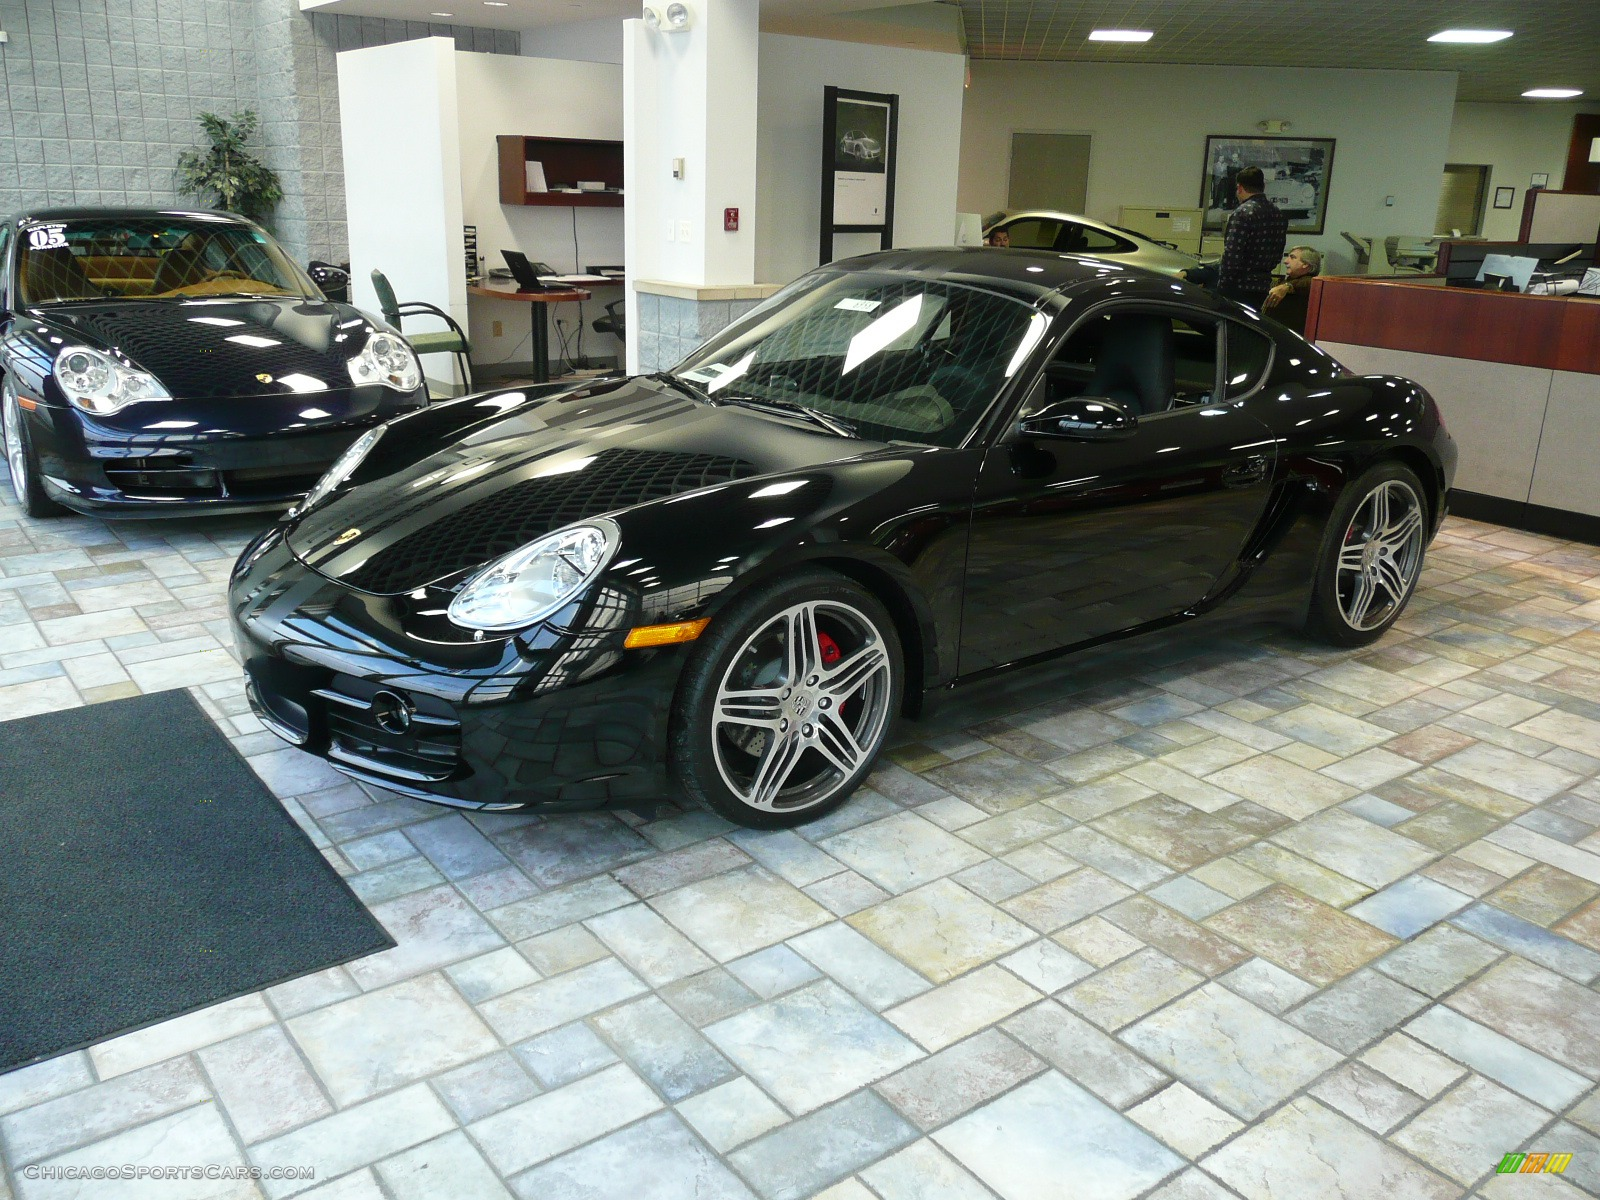 Cayman Black Black / Black Porsche Cayman s